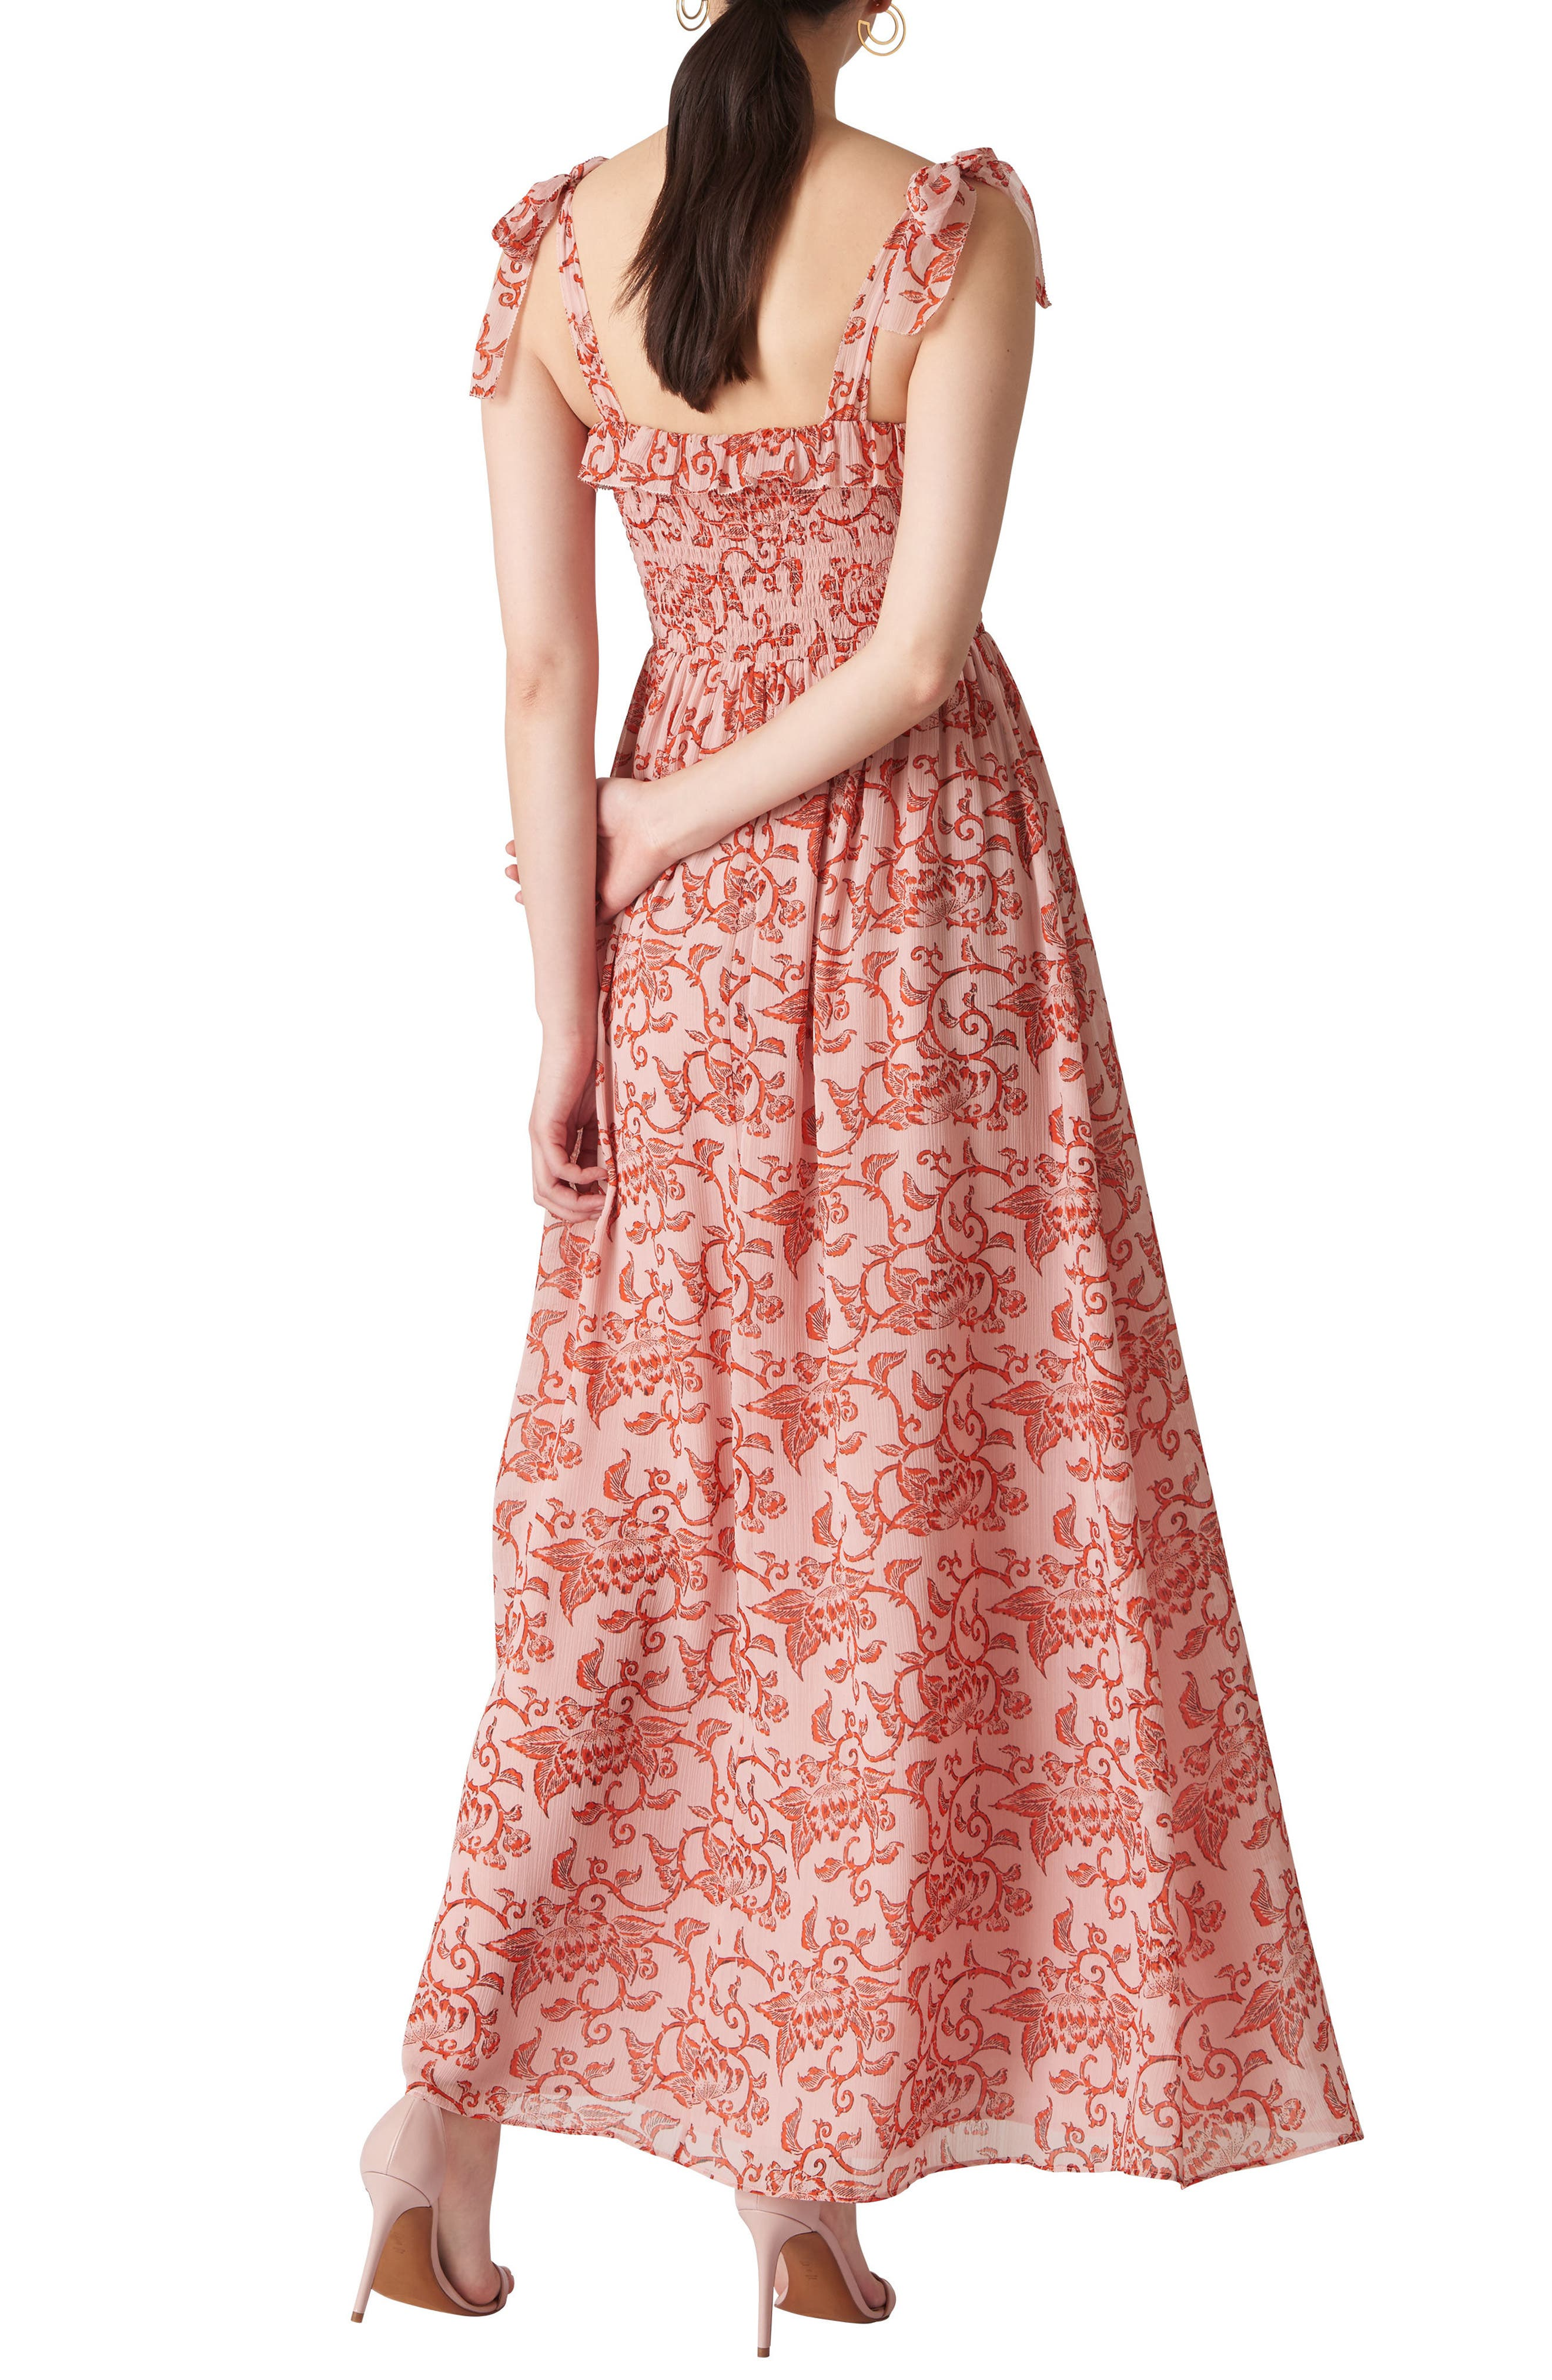 Bali Print Maxi Dress,                             Alternate thumbnail 2, color,                             Pink/ Multi